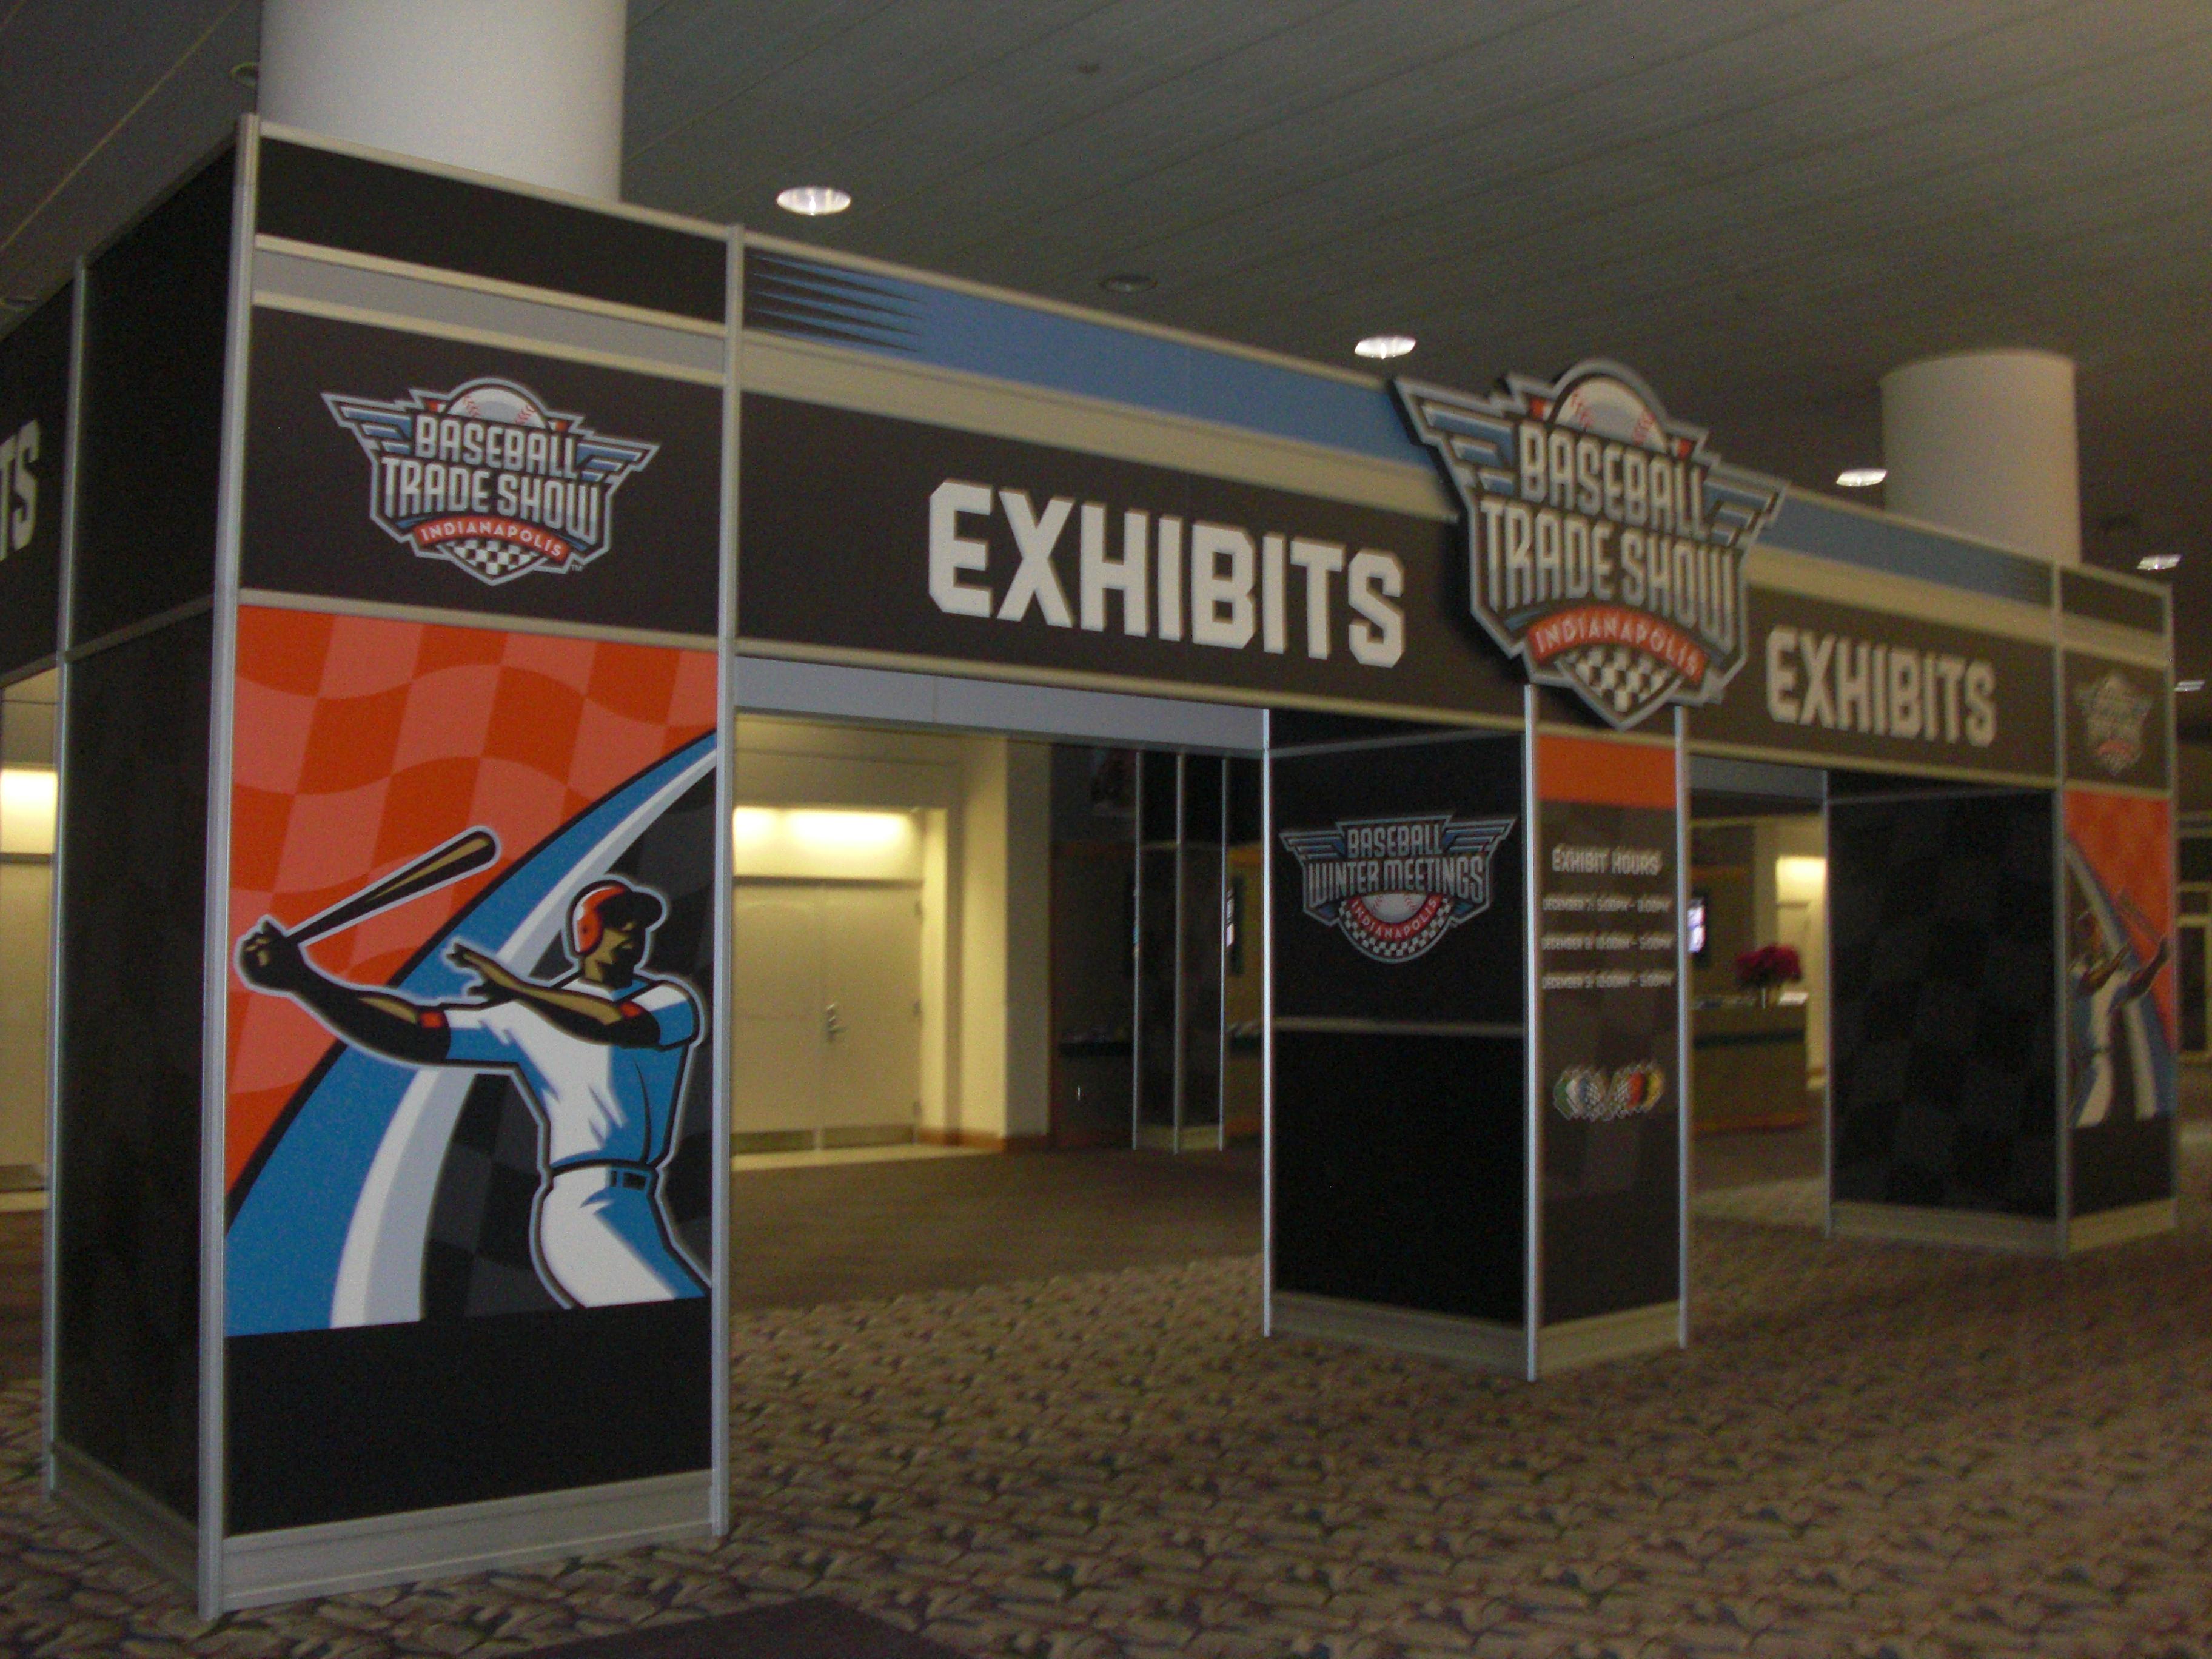 Entrance Trade Show Plexi : Baseball winter meetings trade show corey brinn dot com